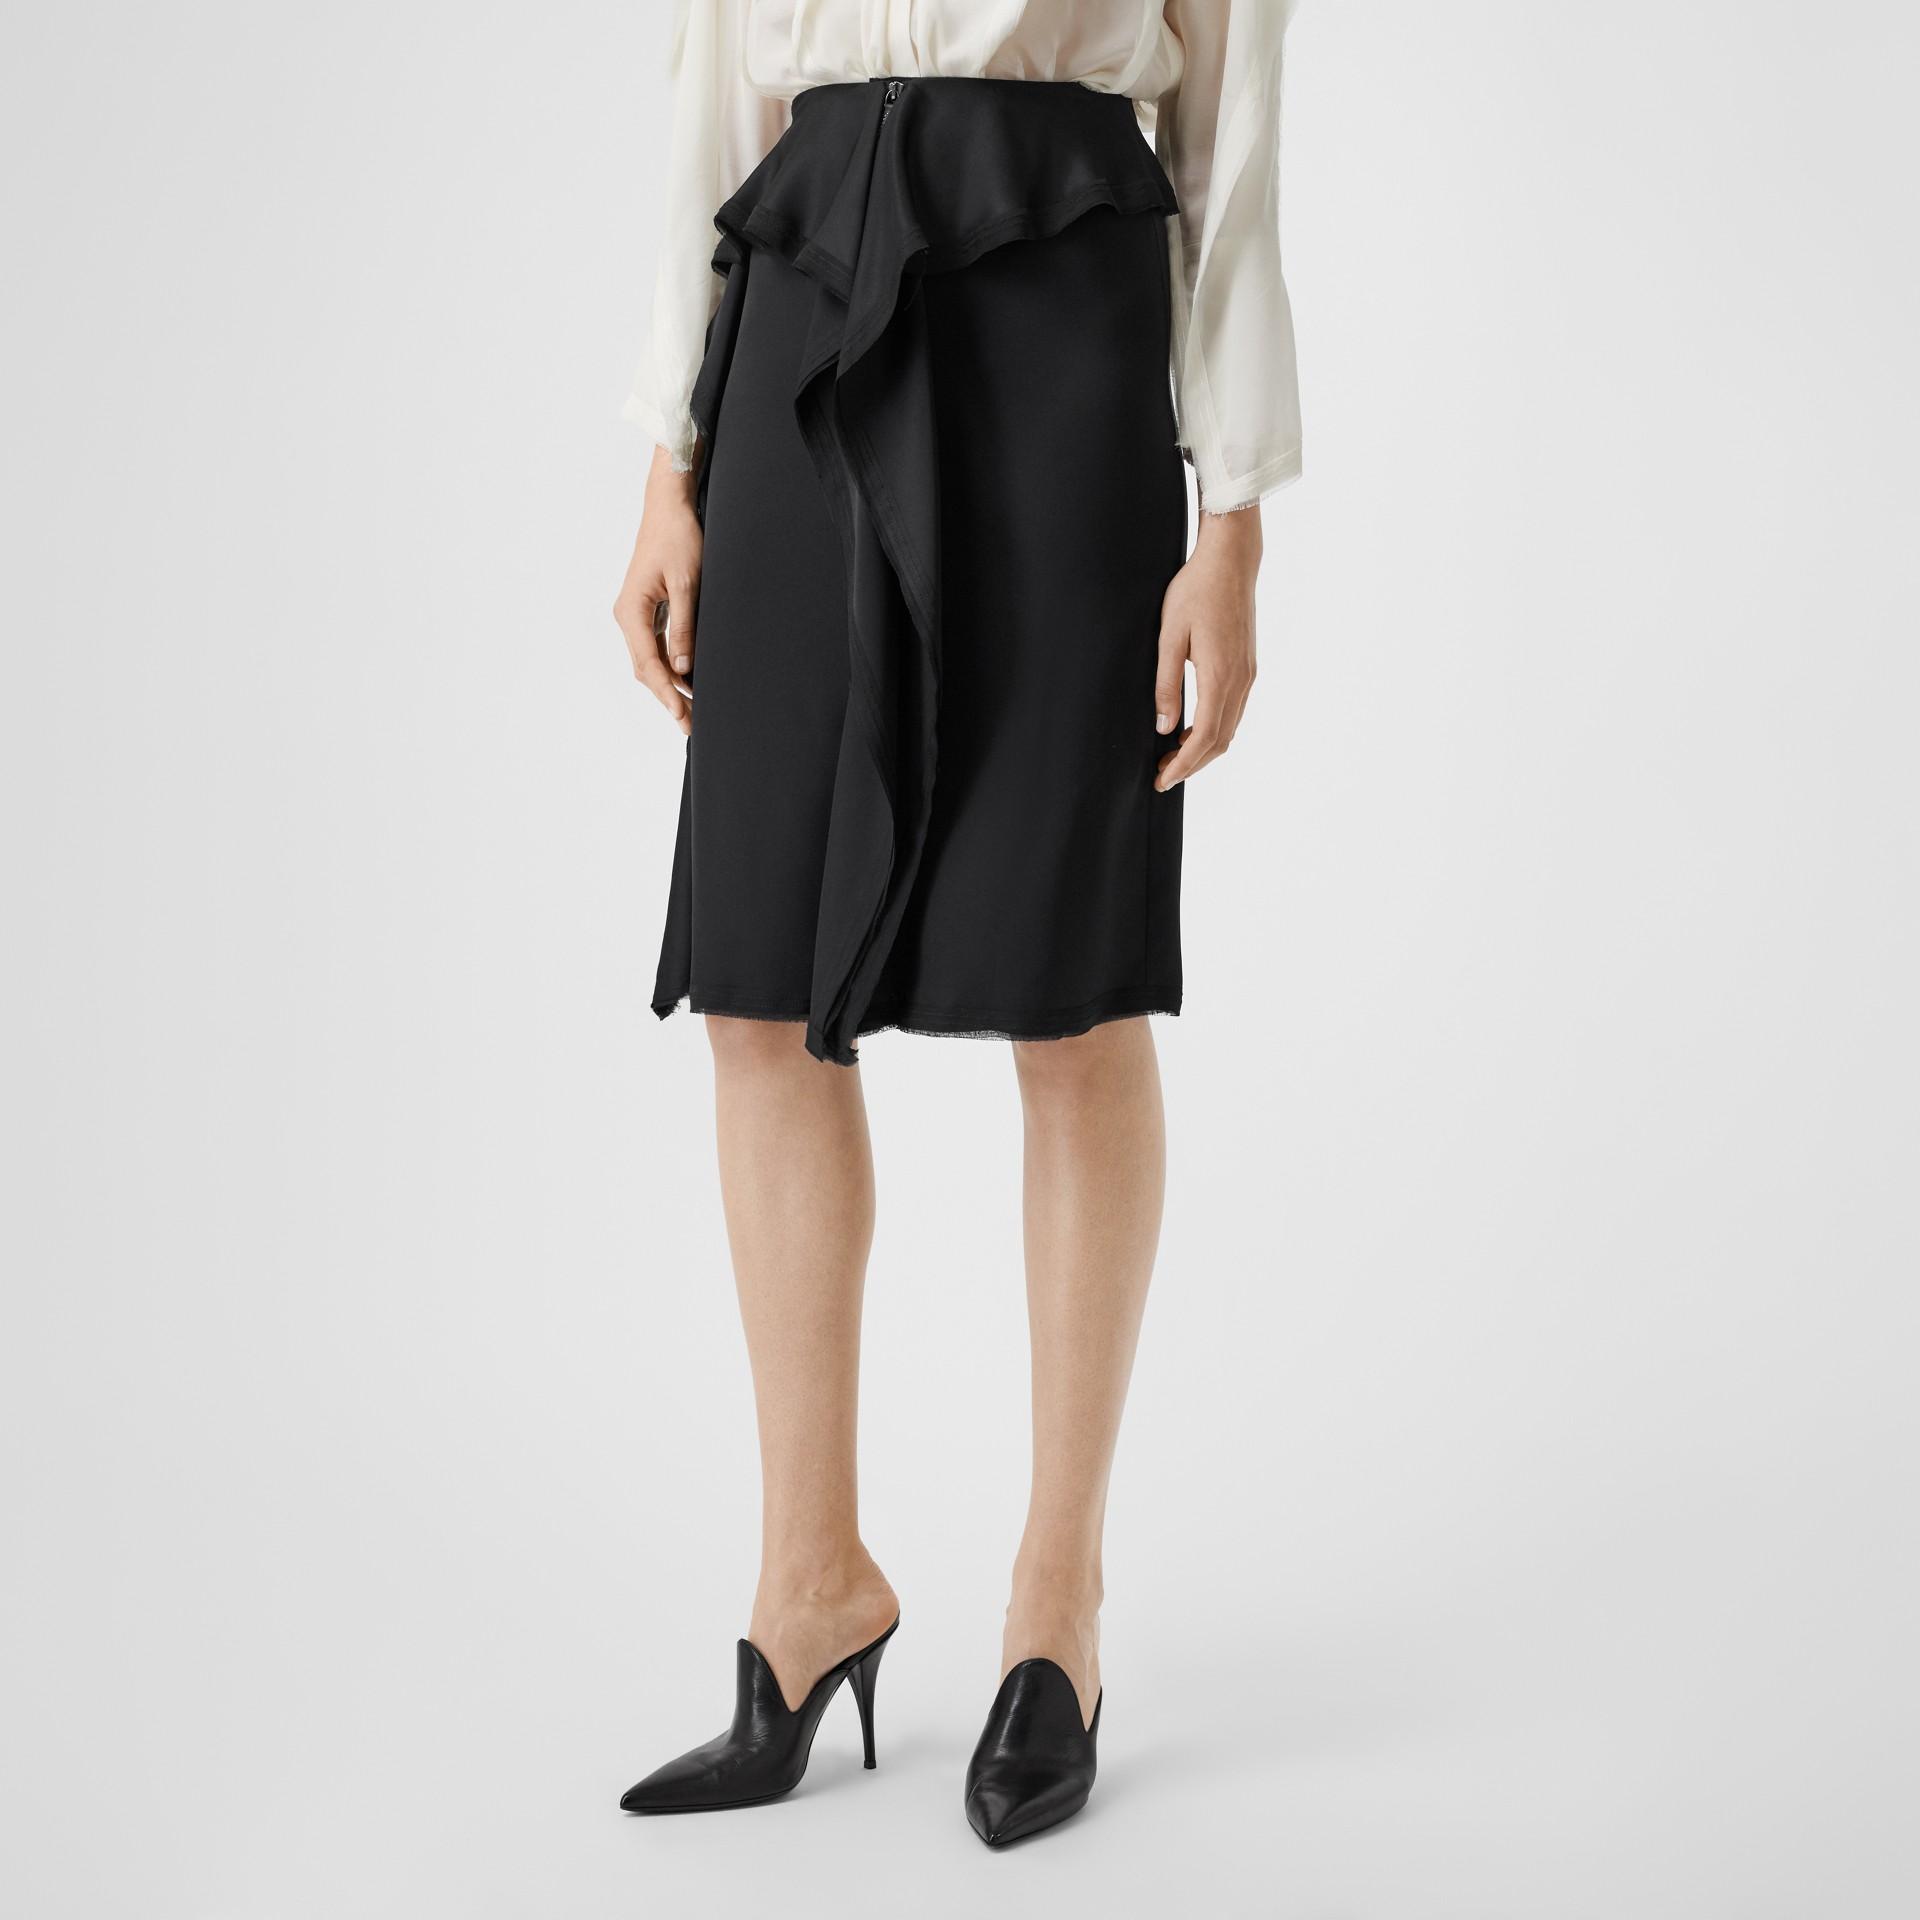 Ruffle Detail Silk Satin Pencil Skirt in Black - Women | Burberry United Kingdom - gallery image 4